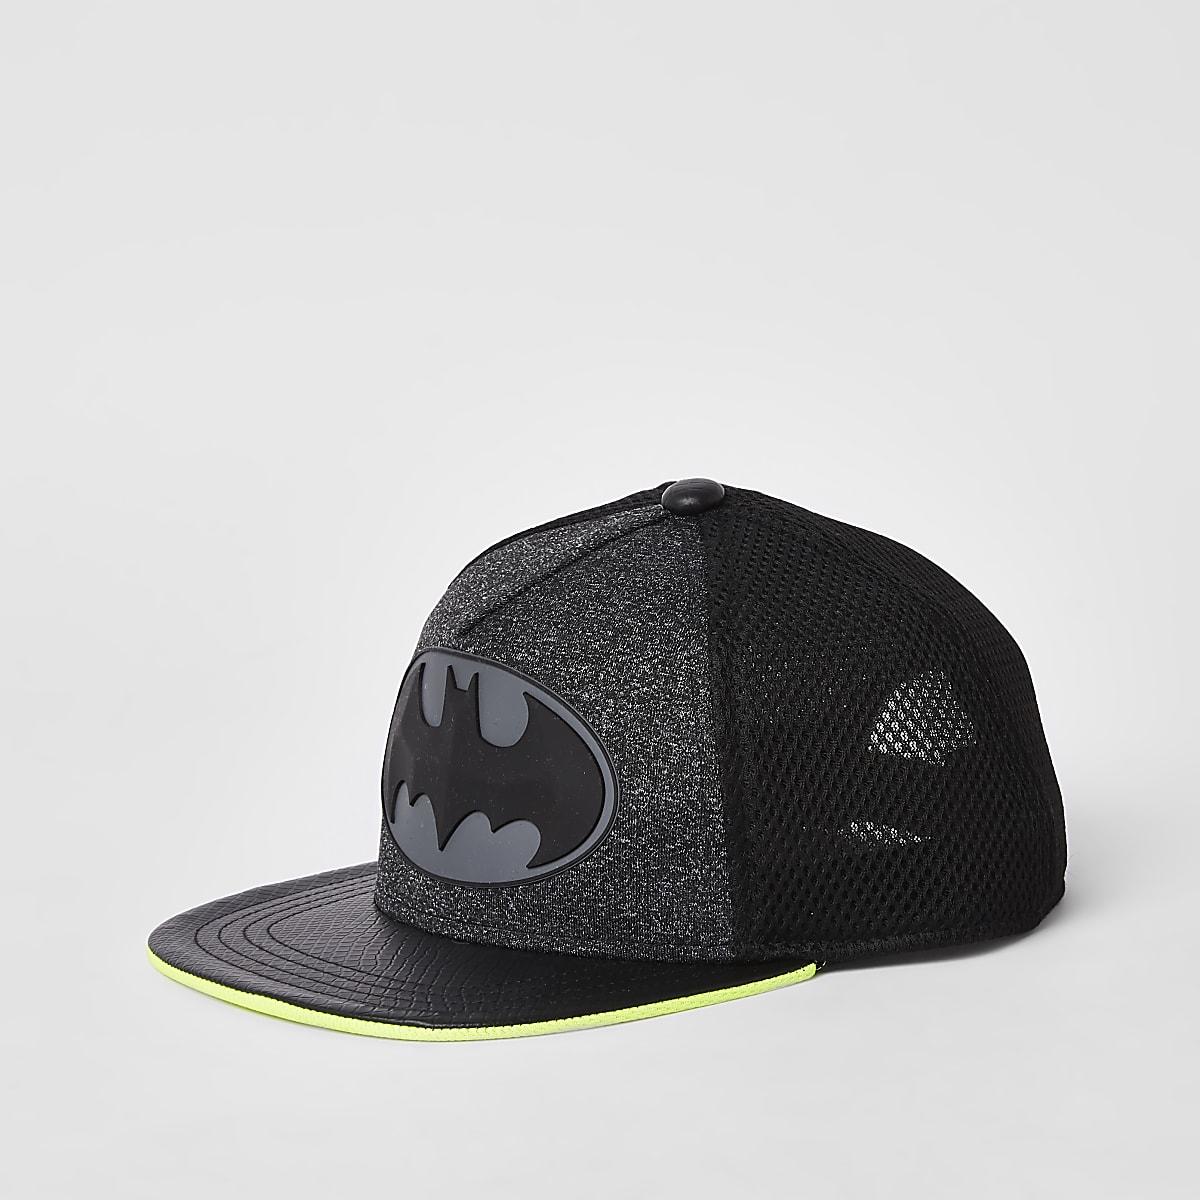 Graue Batman Kappe